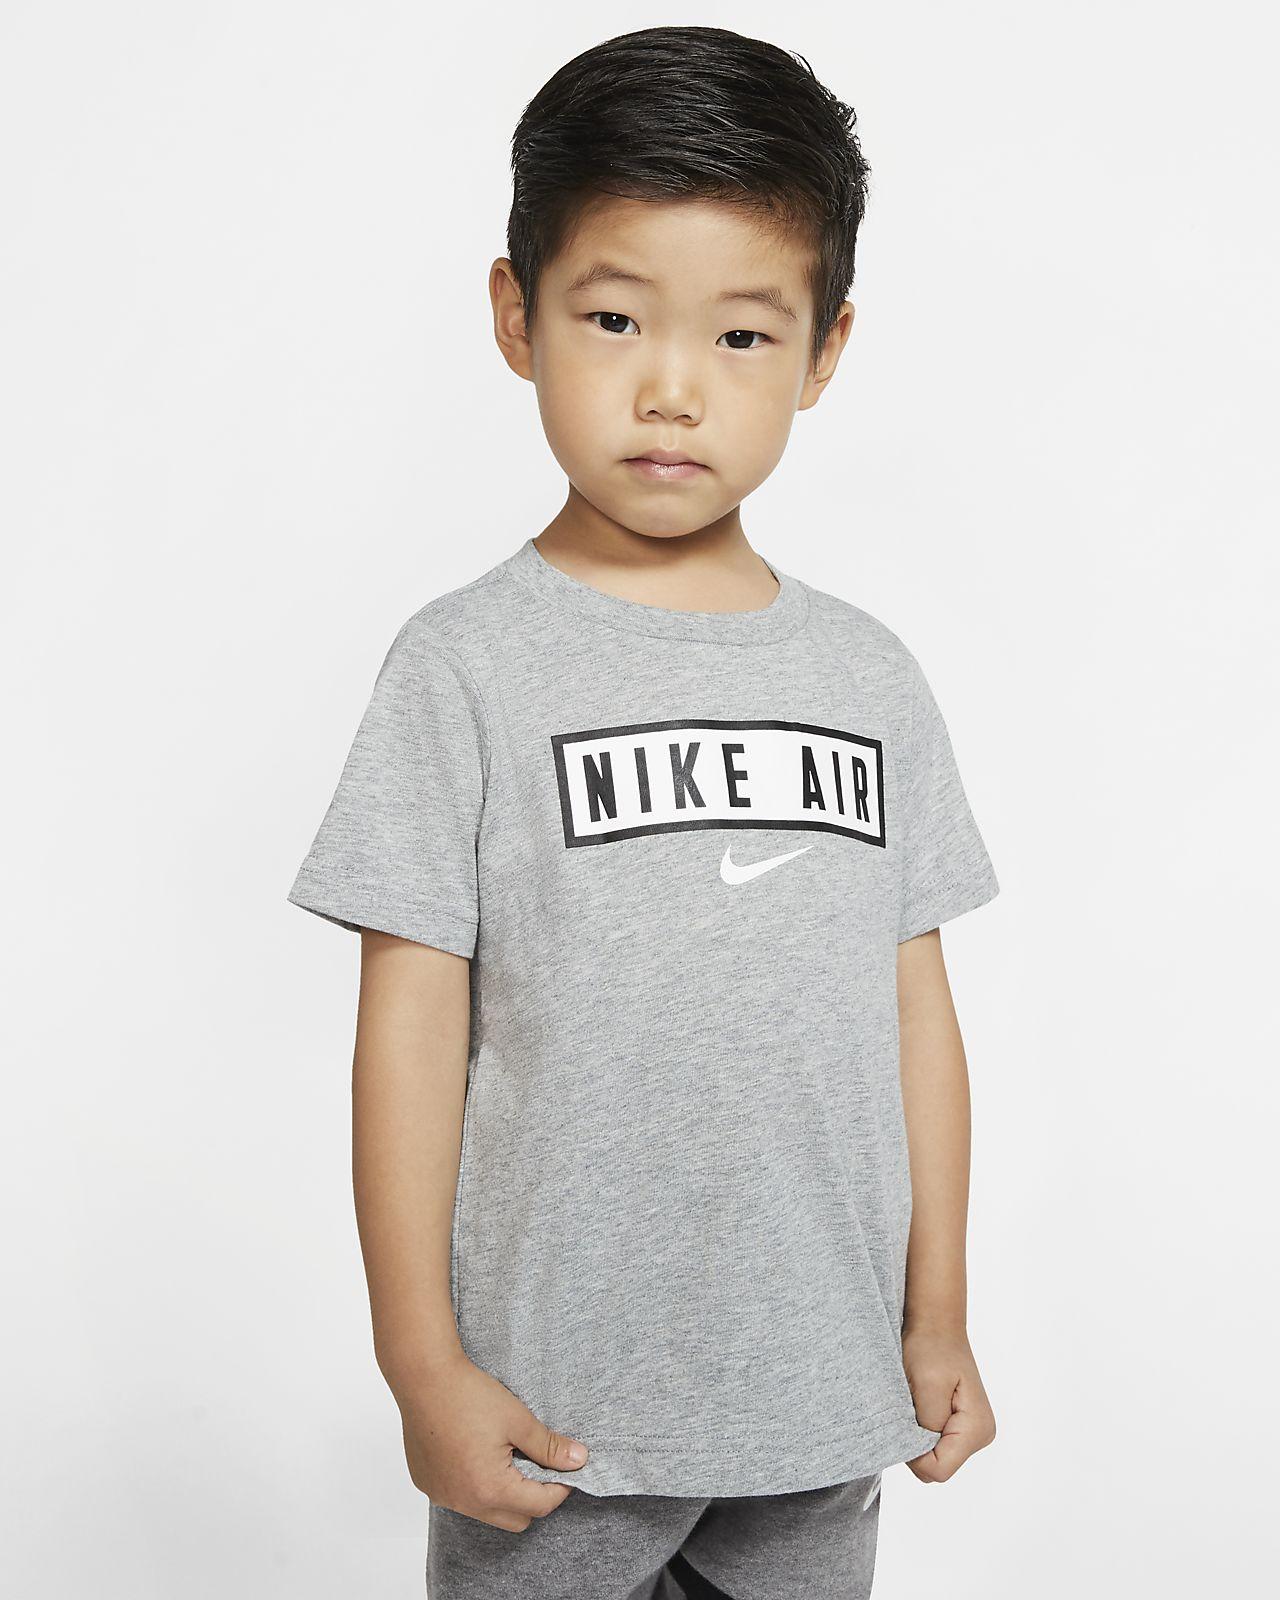 T-shirt Nike Air para bebé